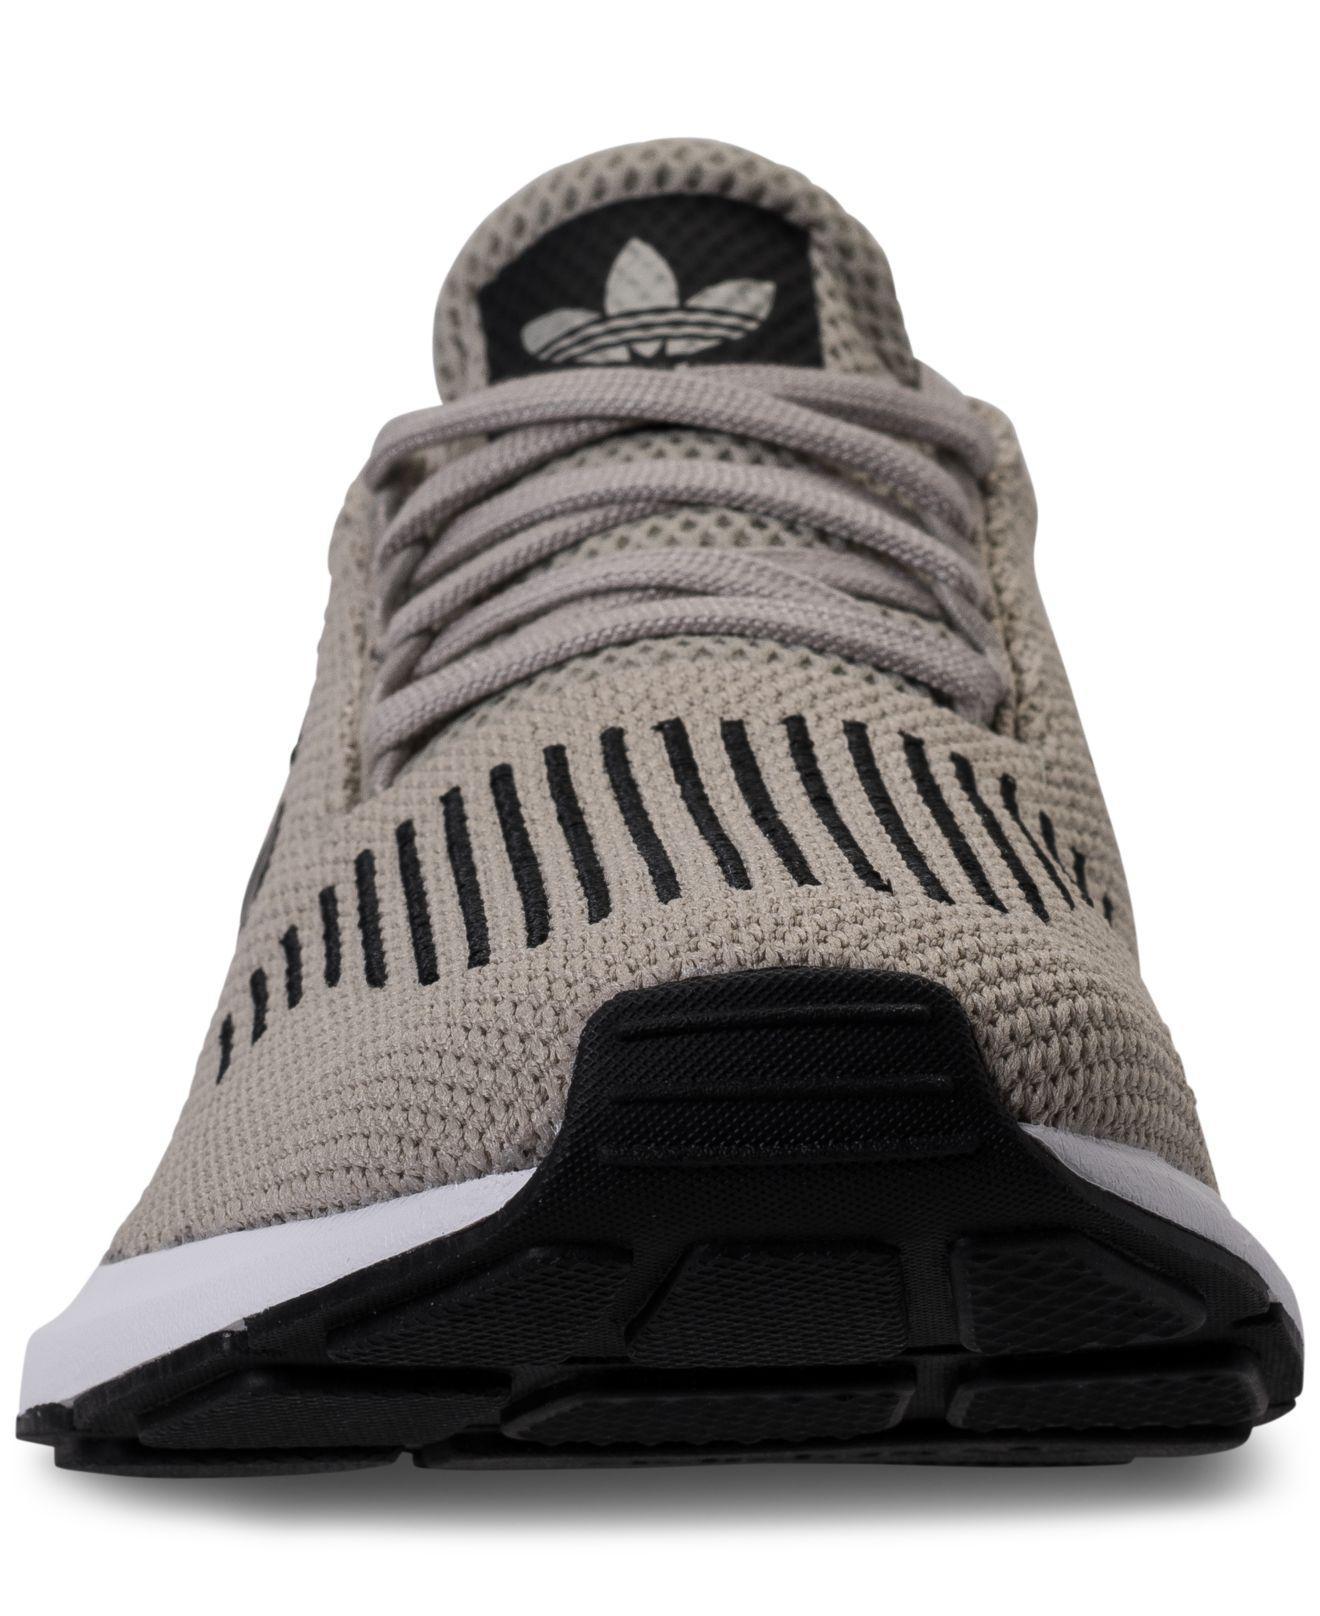 b2a6fa2c4da50 Lyst - adidas Men s Swift Run Casual Sneakers From Finish Line in ...